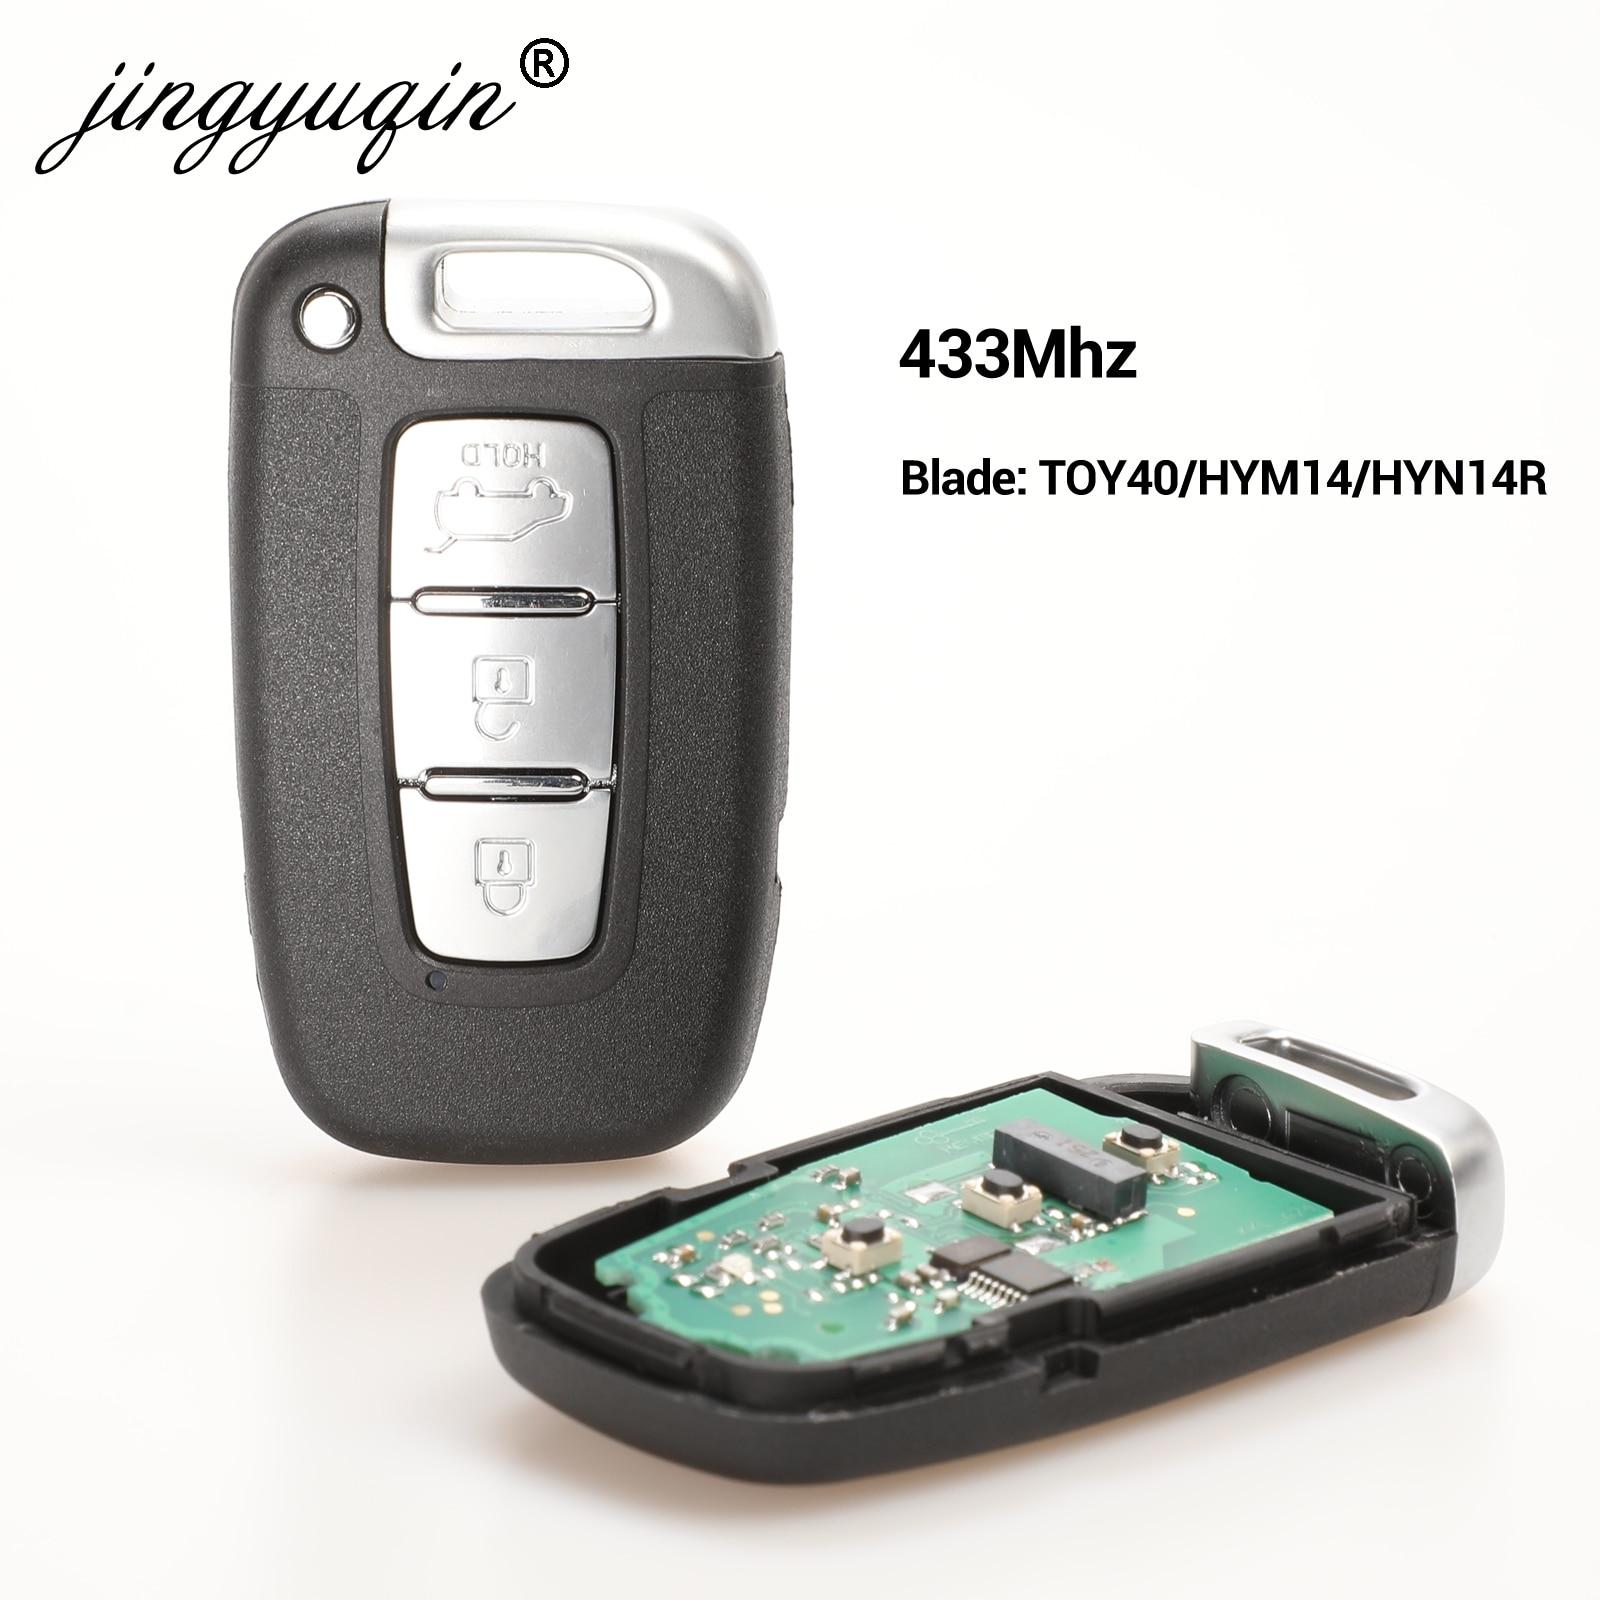 jingyuqin 433Mhz Car Remote Smart Key for HYUNDAI I30 I45 Ix35 Genesis Equus Veloster Tucson Sonata Elantra SY5HMFNA04 For Kia